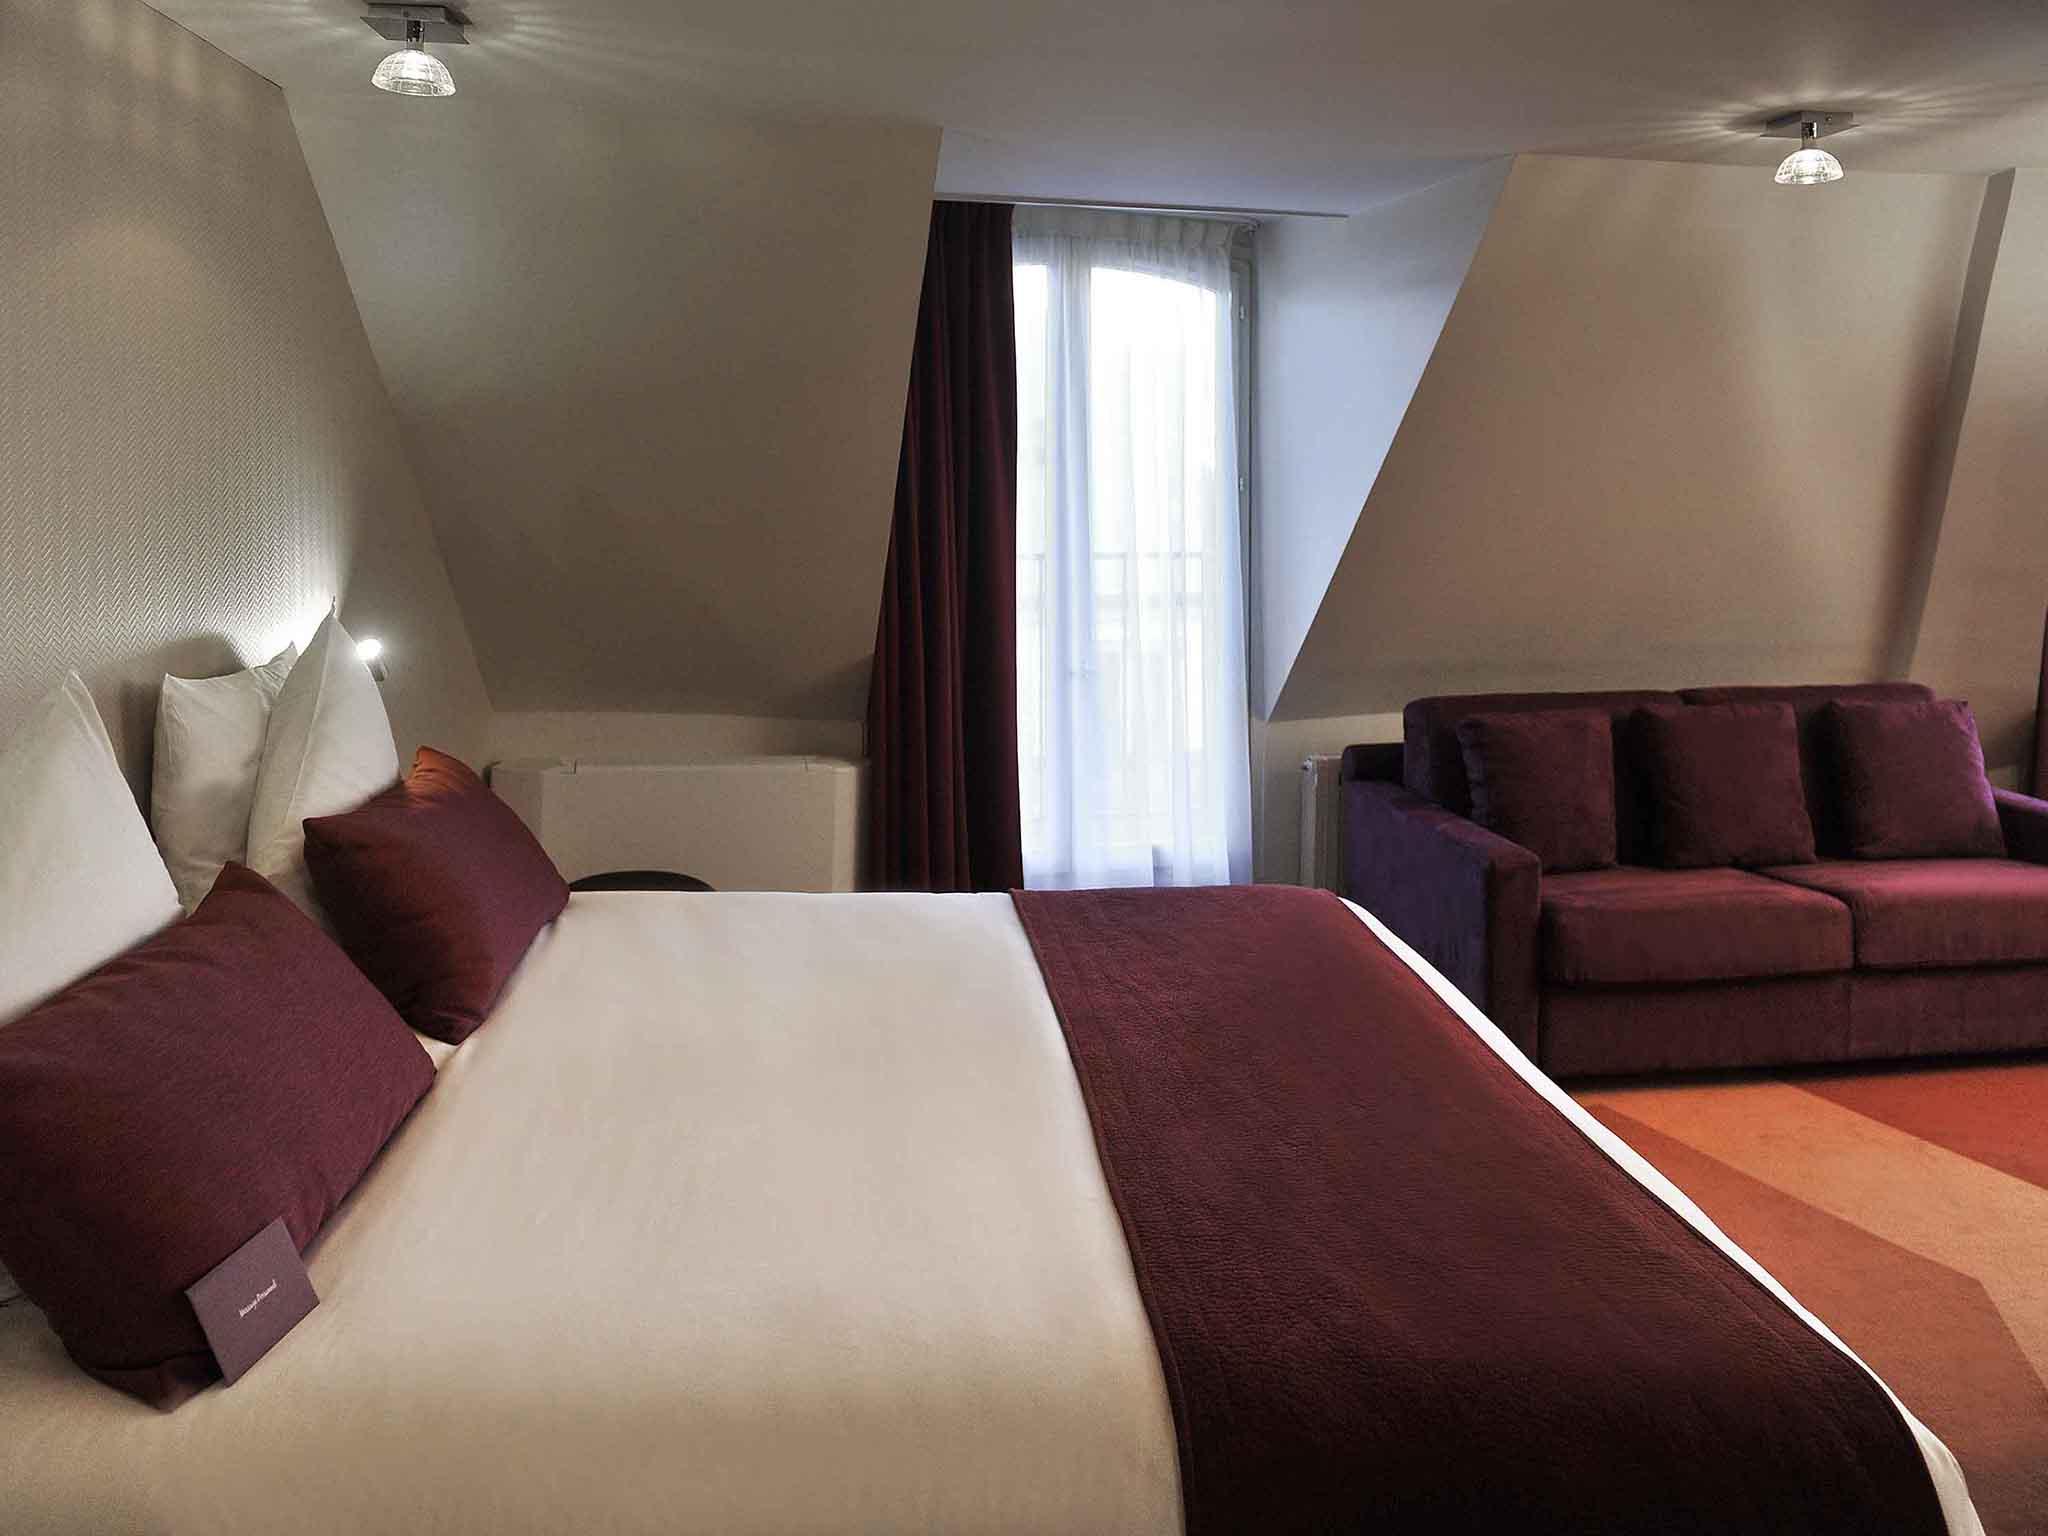 فندق - Mercure باريس أوبرا لافاييت